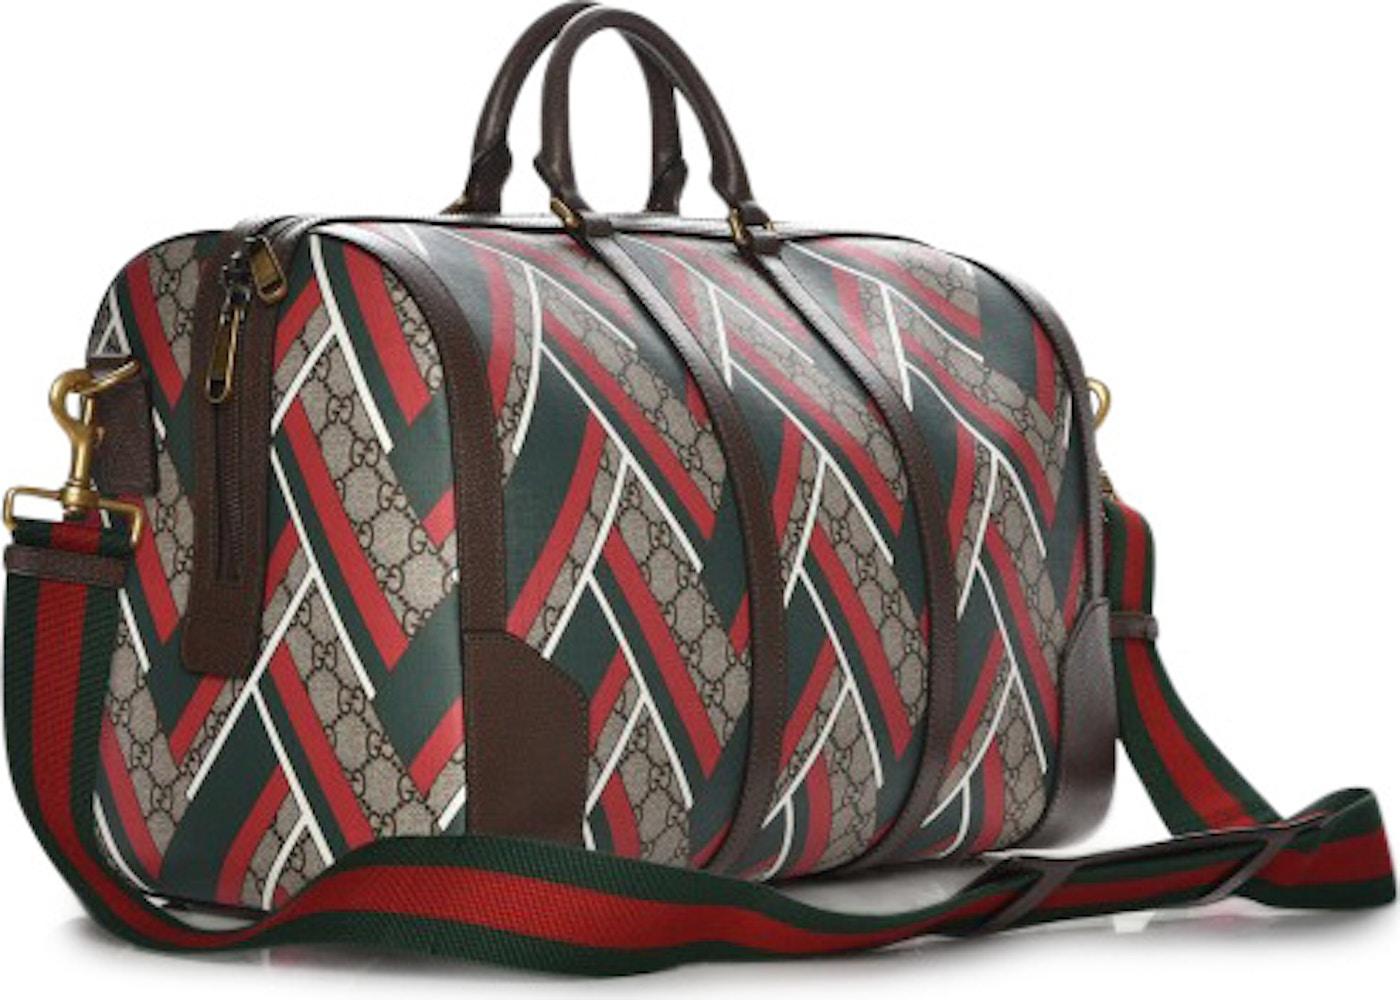 eec69d170dd9 Gucci Duffle Bag Monogram GG Supreme Chevron Web Medium Brown